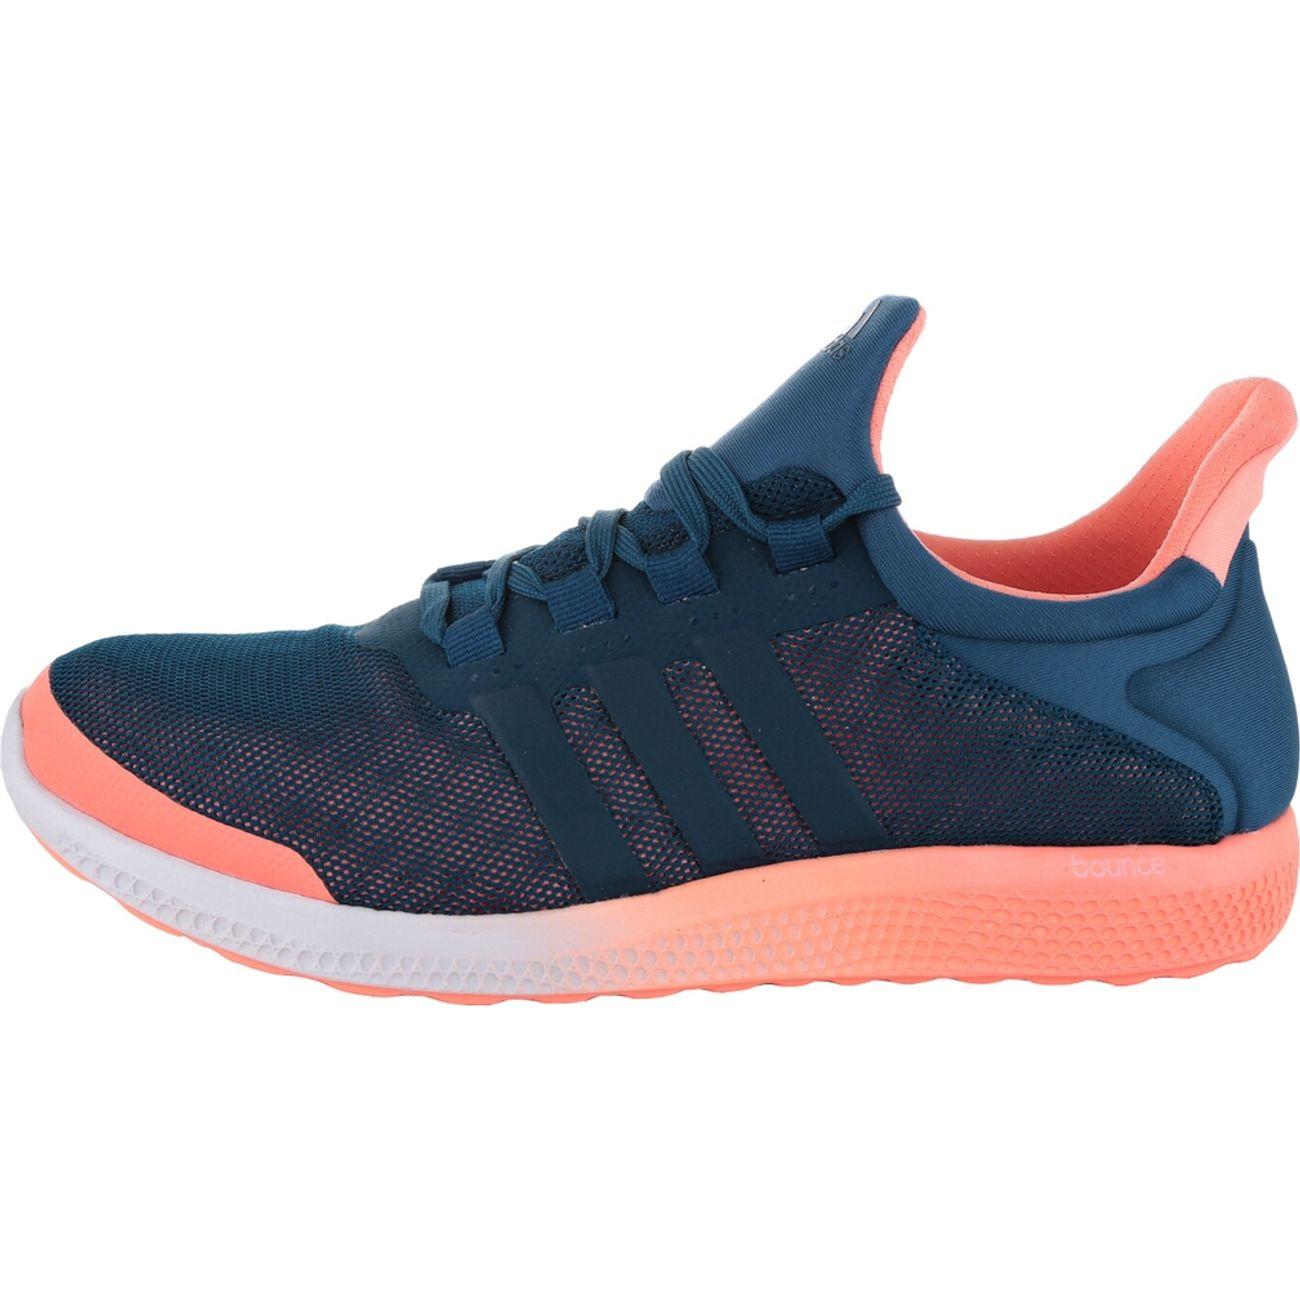 Adidas Femme 36 Cc Chaussures Fitness 23 Sonic 23 Running 36 qEwxZt